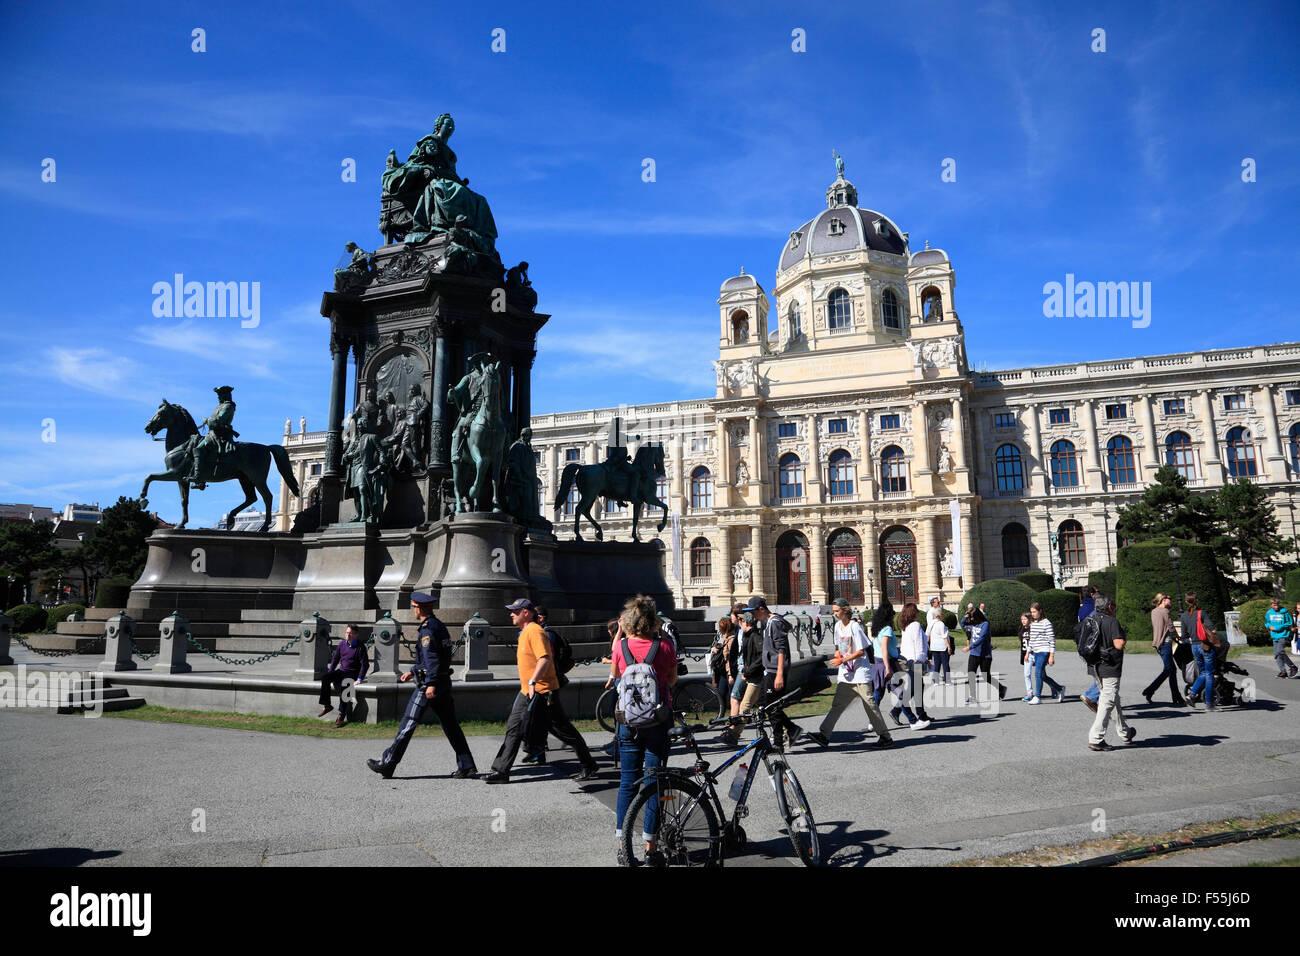 Naturhistorisches Museum  (museum of natural history)  und Maria Theresien square, Vienna, Austria, Europe - Stock Image